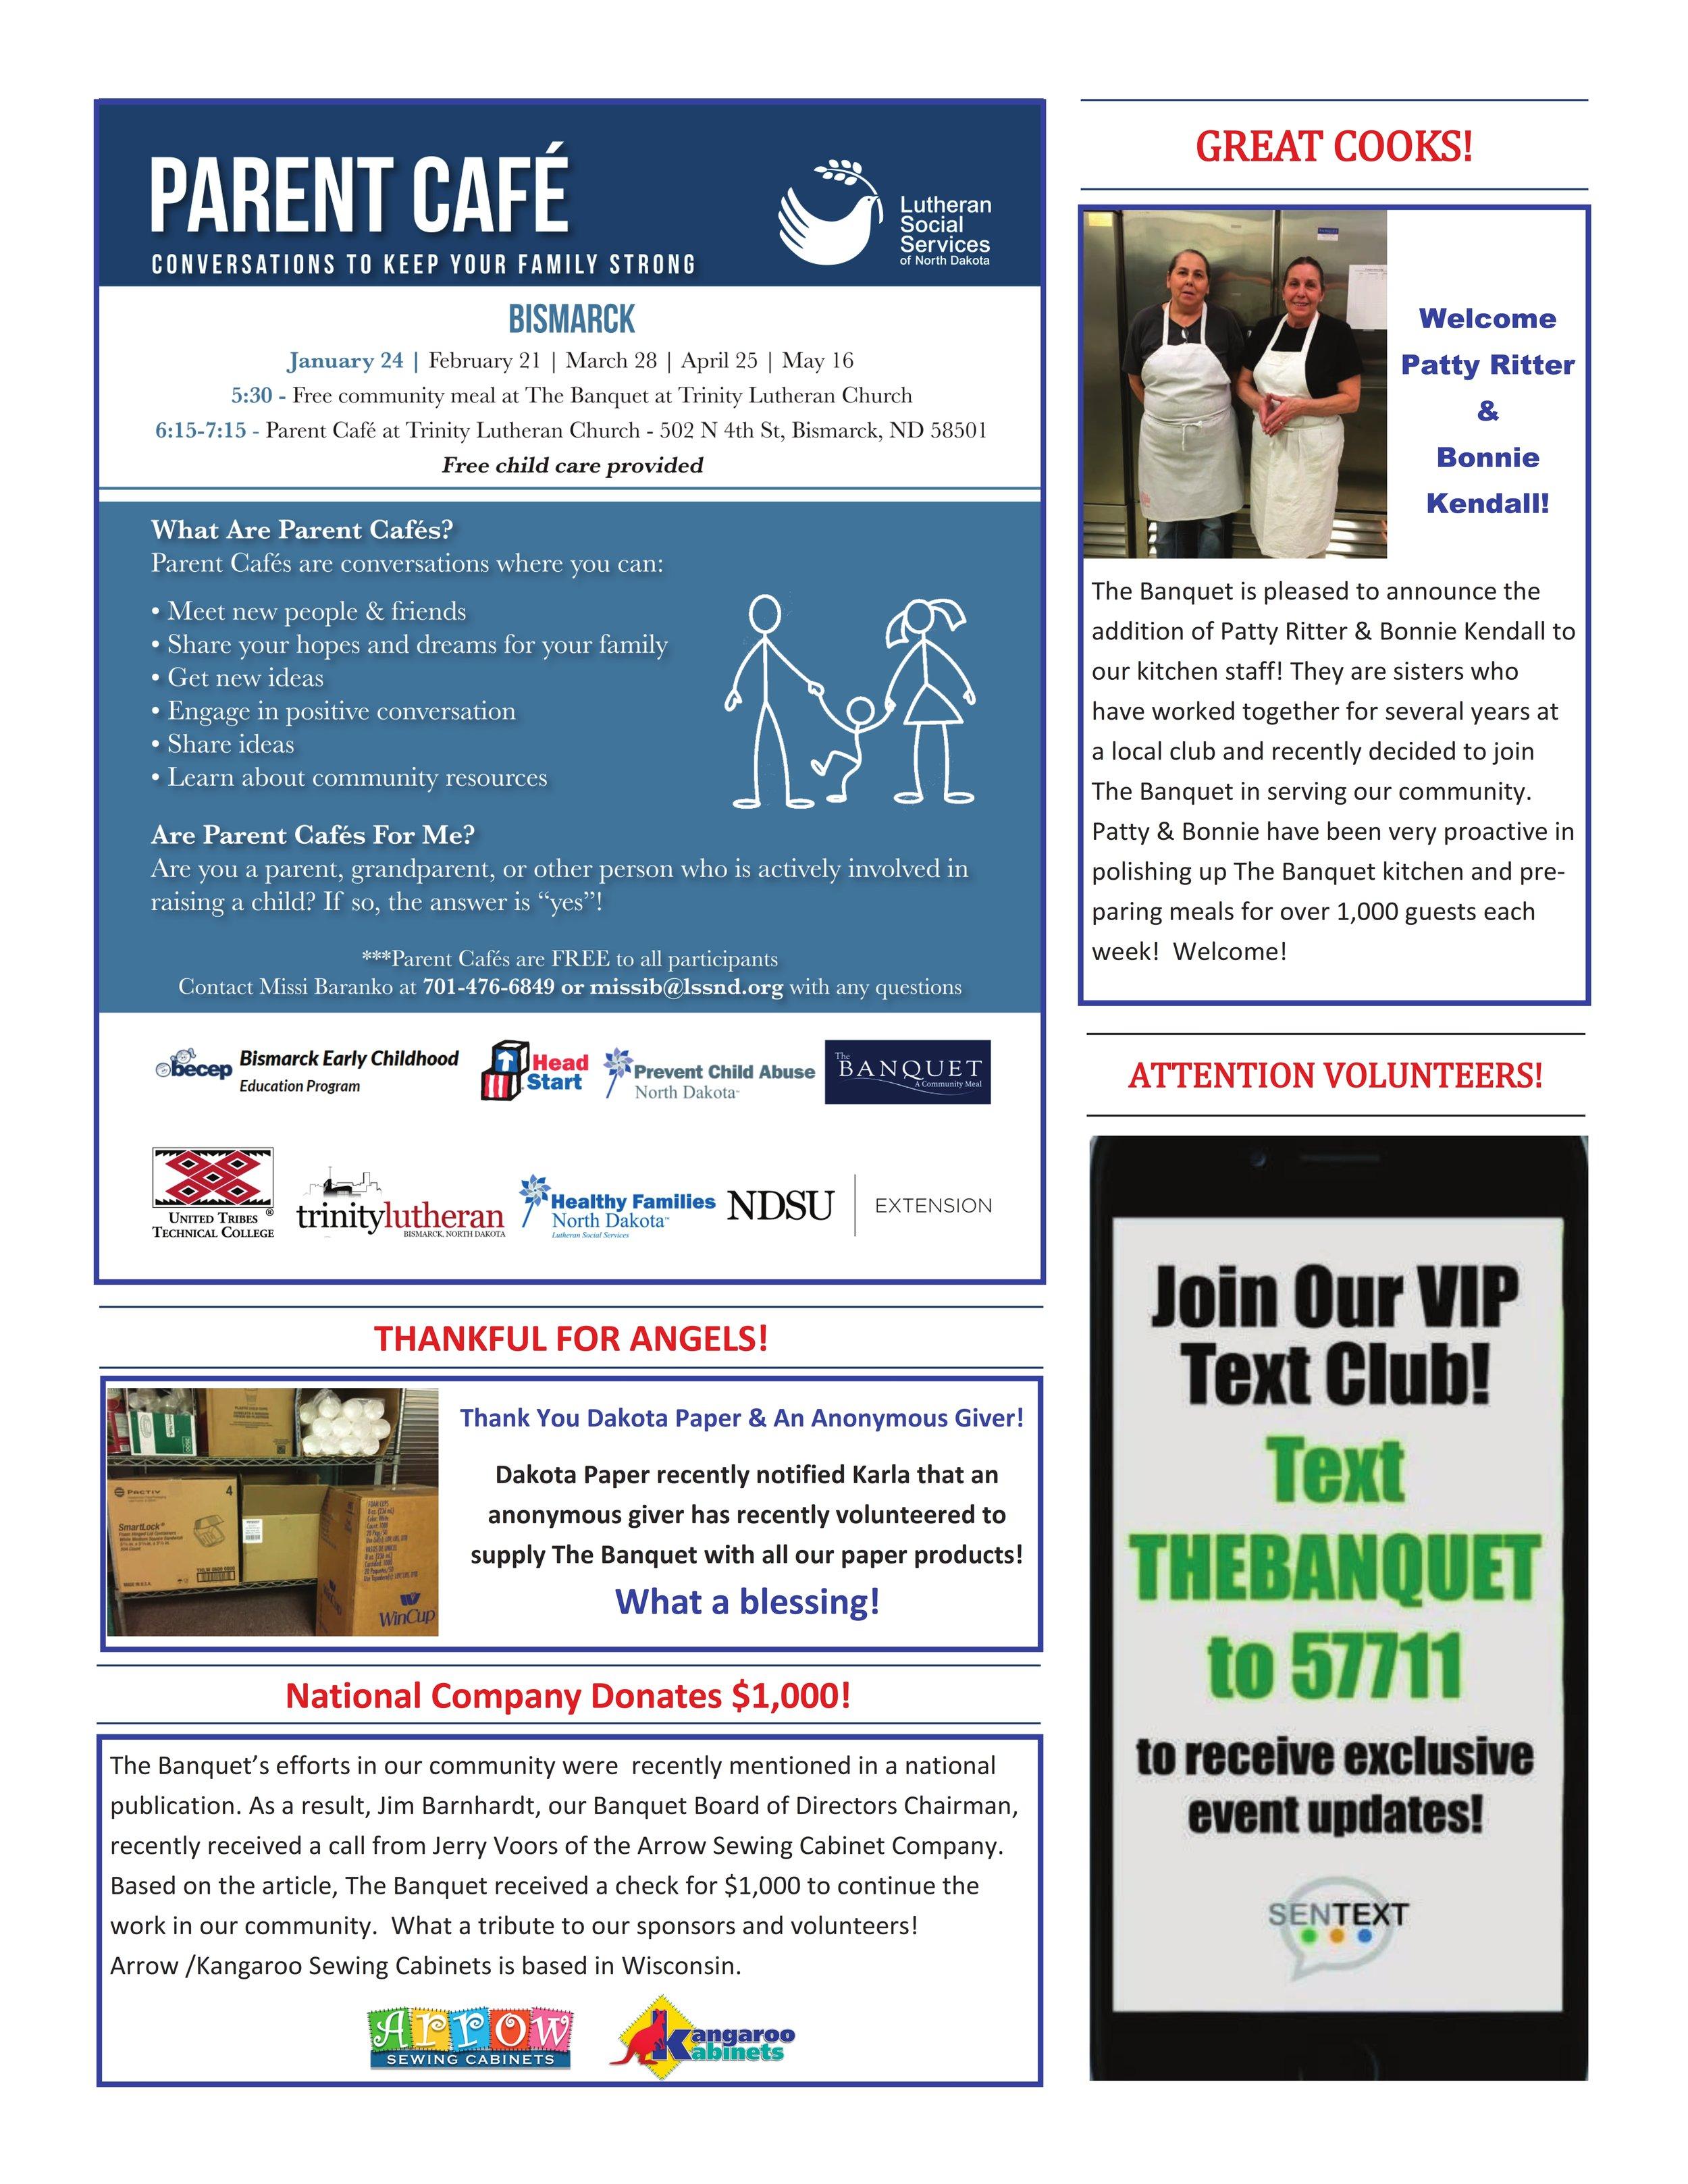 Banquet Newsletter Final Complete-Image Printing-Jan. 22, 2019_005.jpg